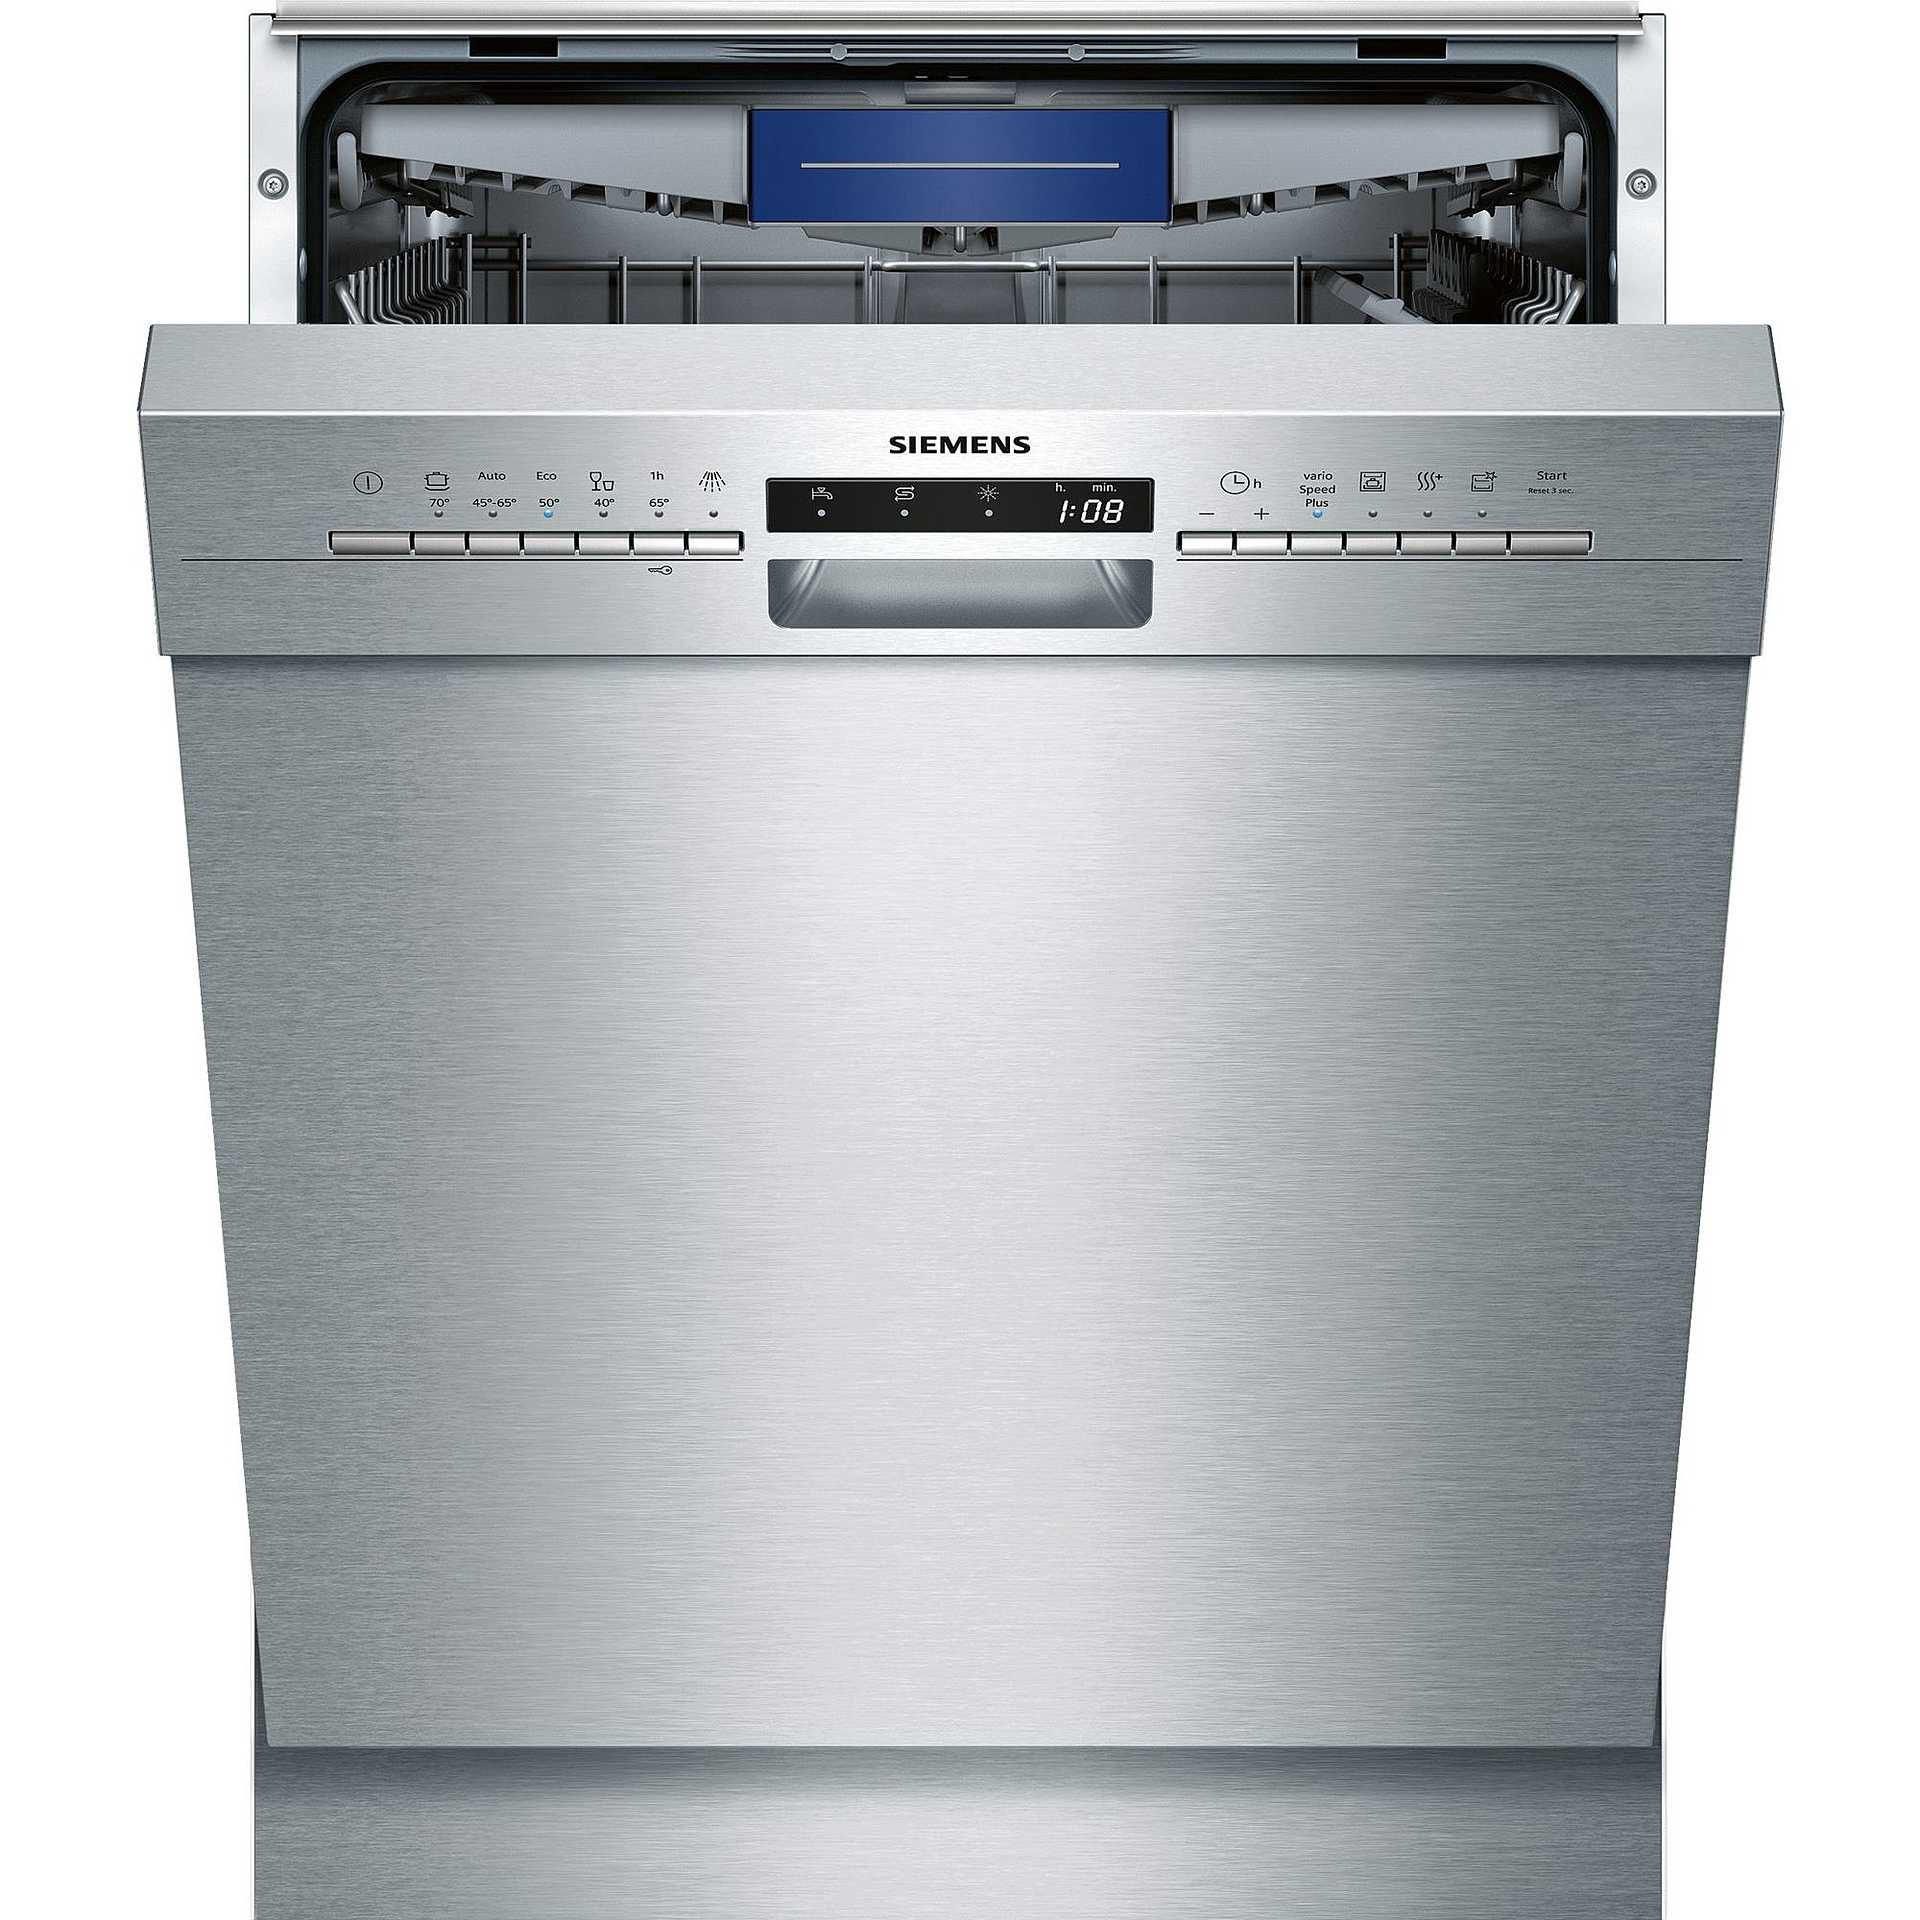 Siemens SN436S01KE iQ300 lavastoviglie da semi incasso 13 coperti 6 ...